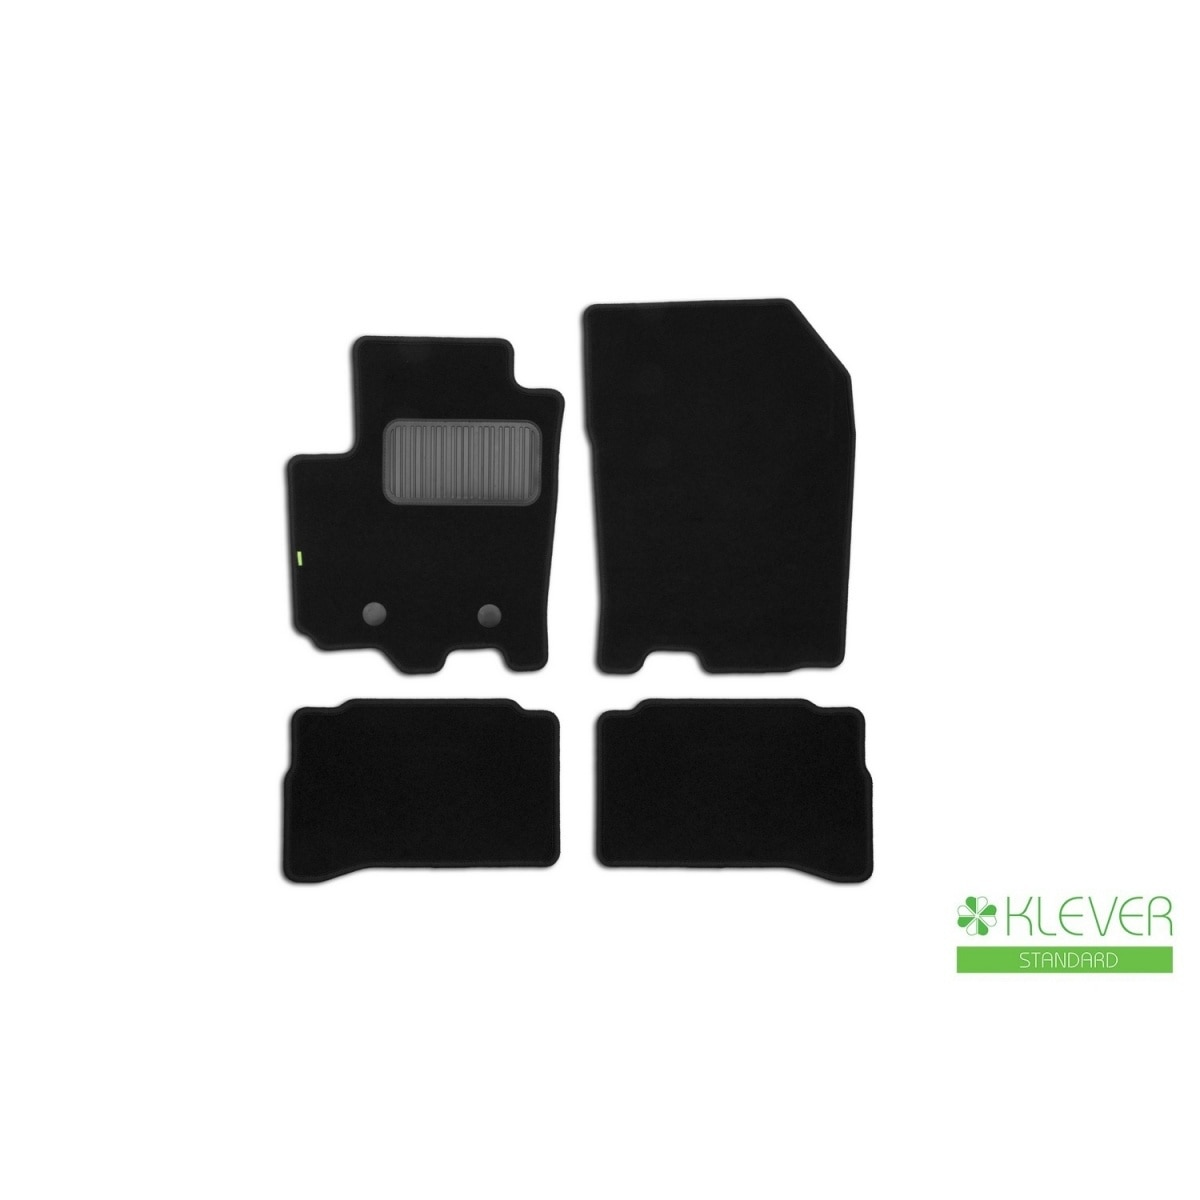 Floor mats Klever standard Suzuki Vitara 2015-, cross, 4 PCs